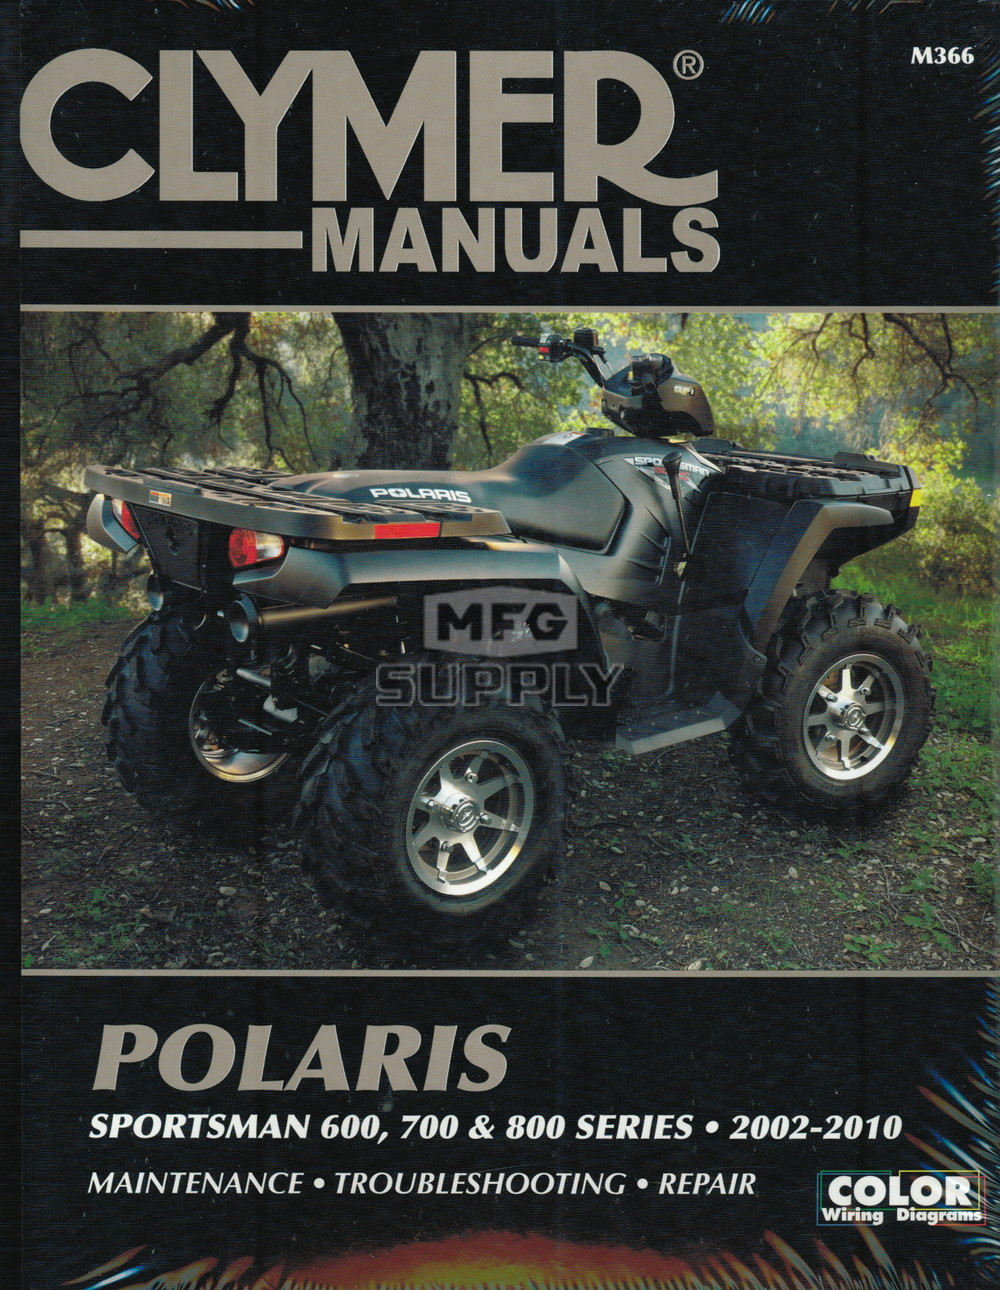 medium resolution of 2006 polaris sportsman 600 wiring diagram cm366 02 10 polaris sportsman 600 700 u0026 800 series repaircm366 02 10 polaris